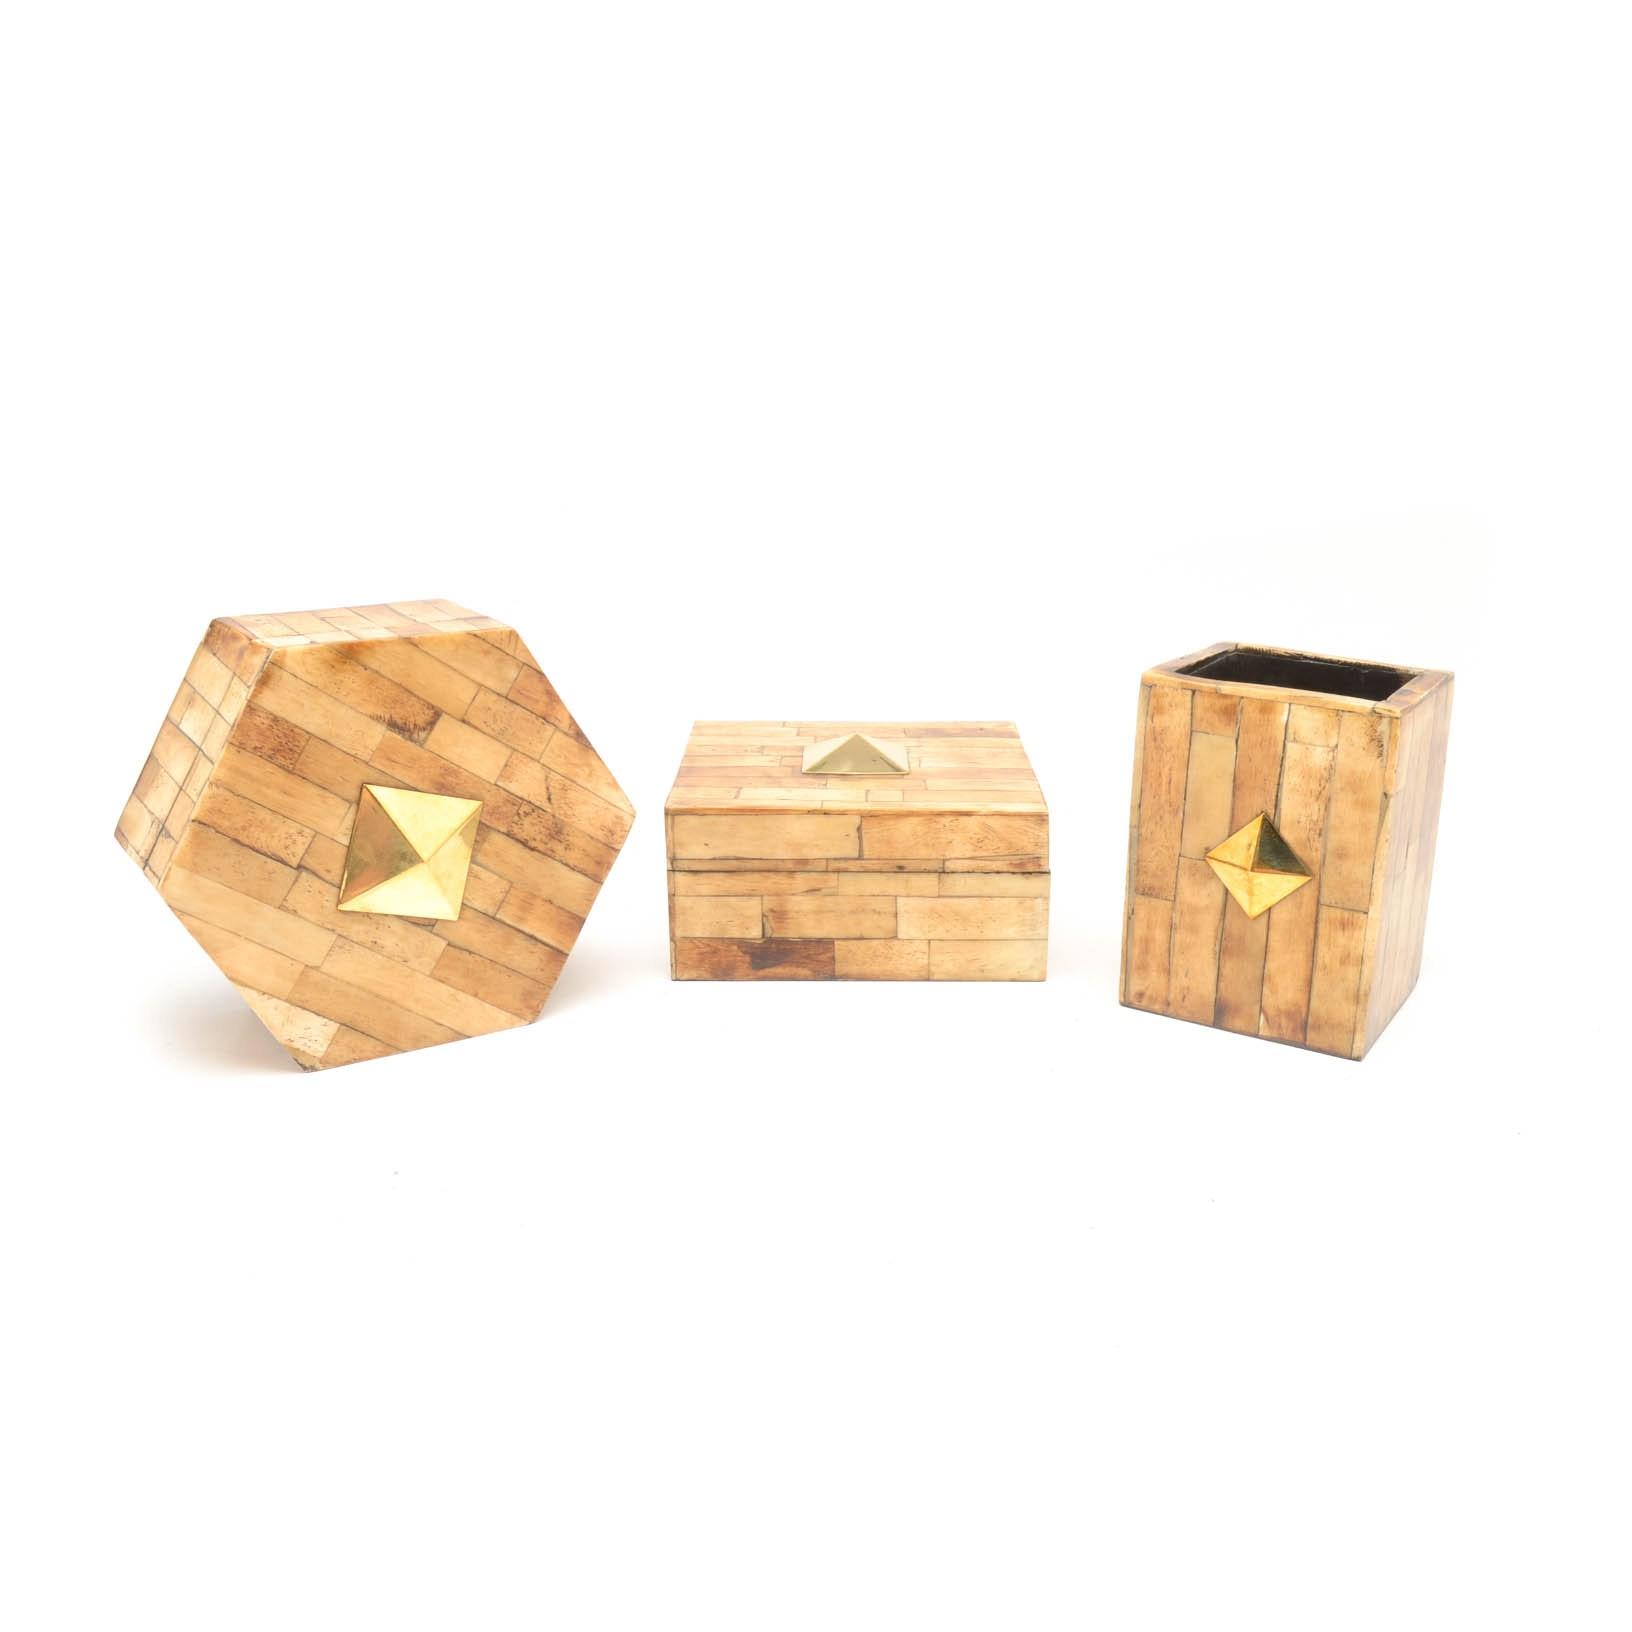 Set of Decorative Acacia Veneer Parquetry Boxes